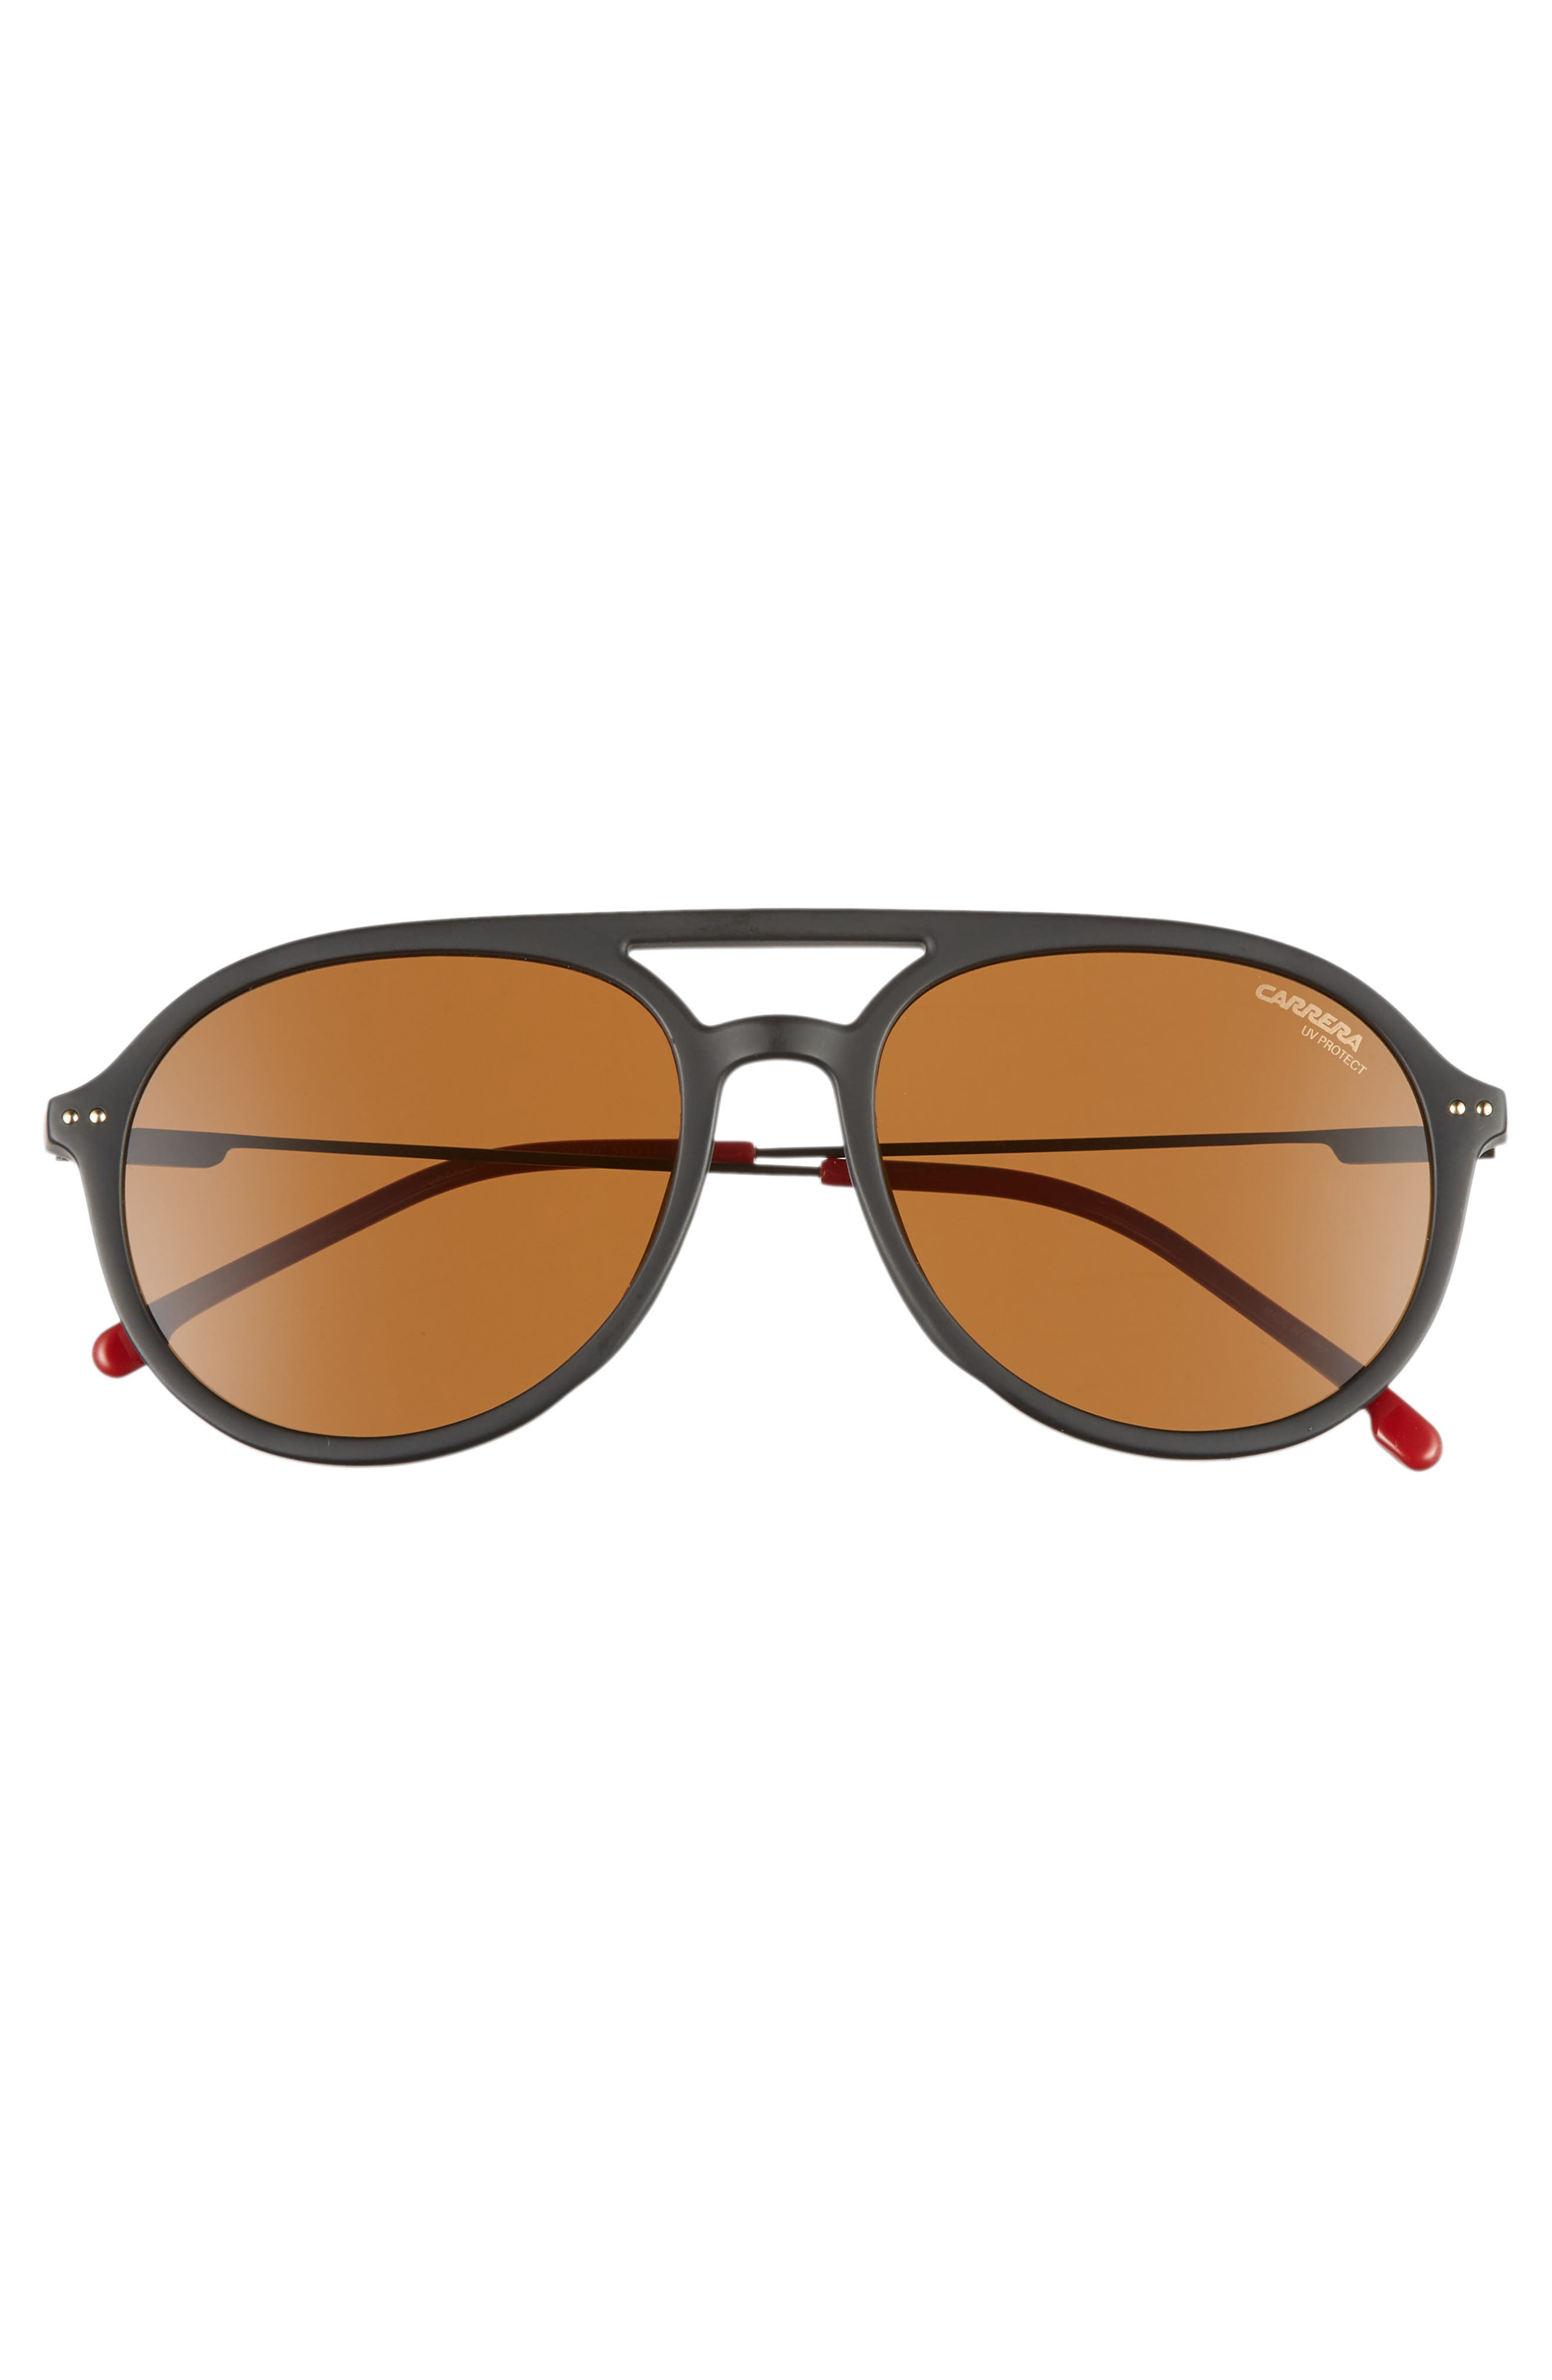 53mm Aviator Sunglasses,                             Alternate thumbnail 3, color,                             MATTE BLACK